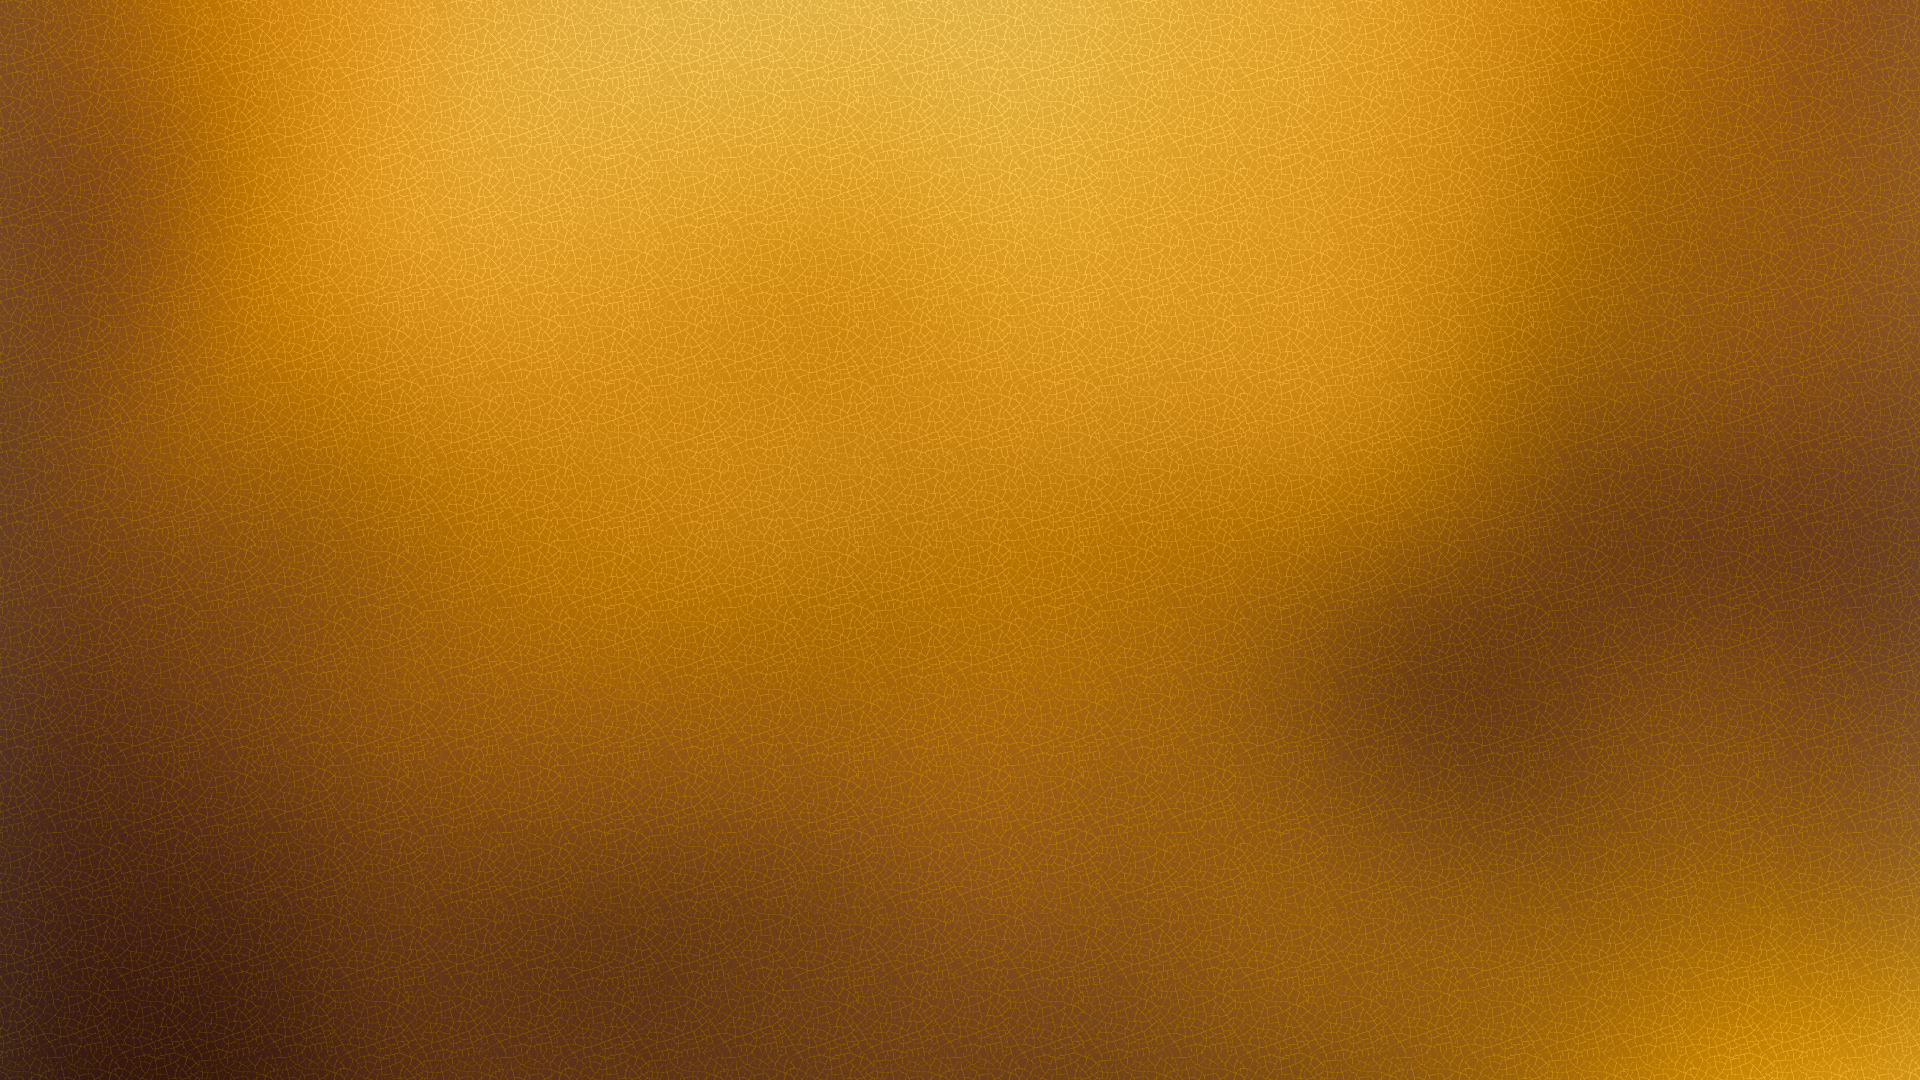 Gold Metallic Wallpaper